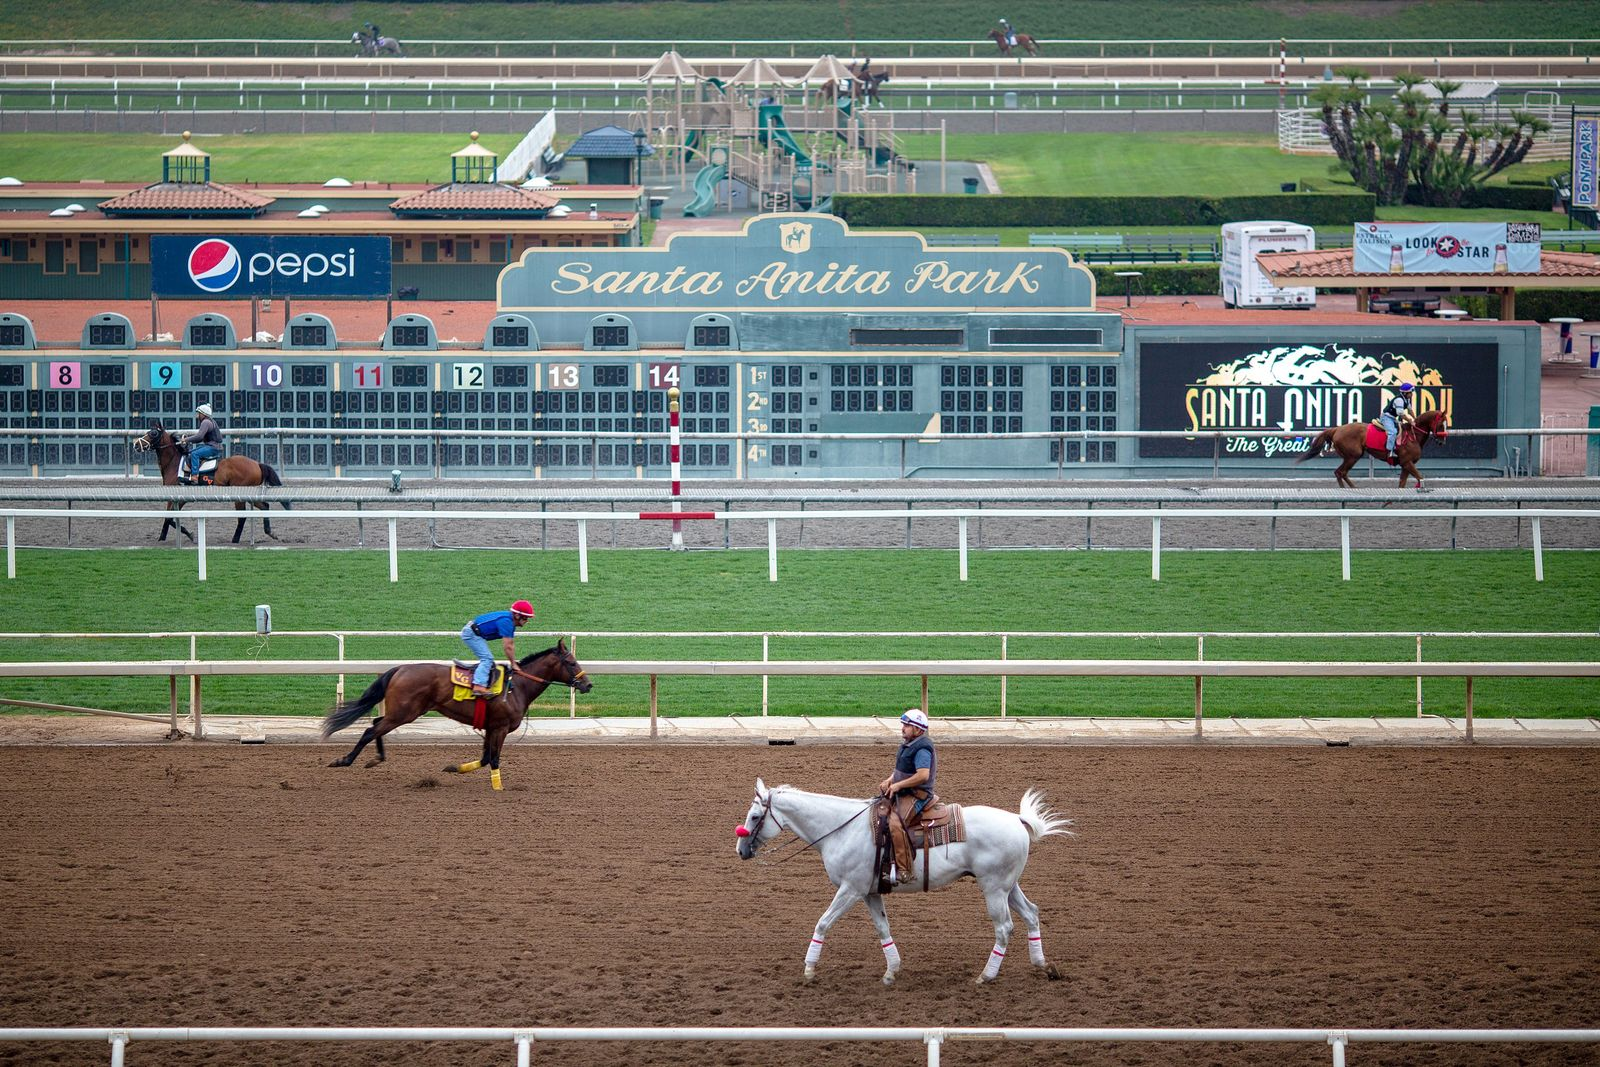 Santa Anita horse racing park